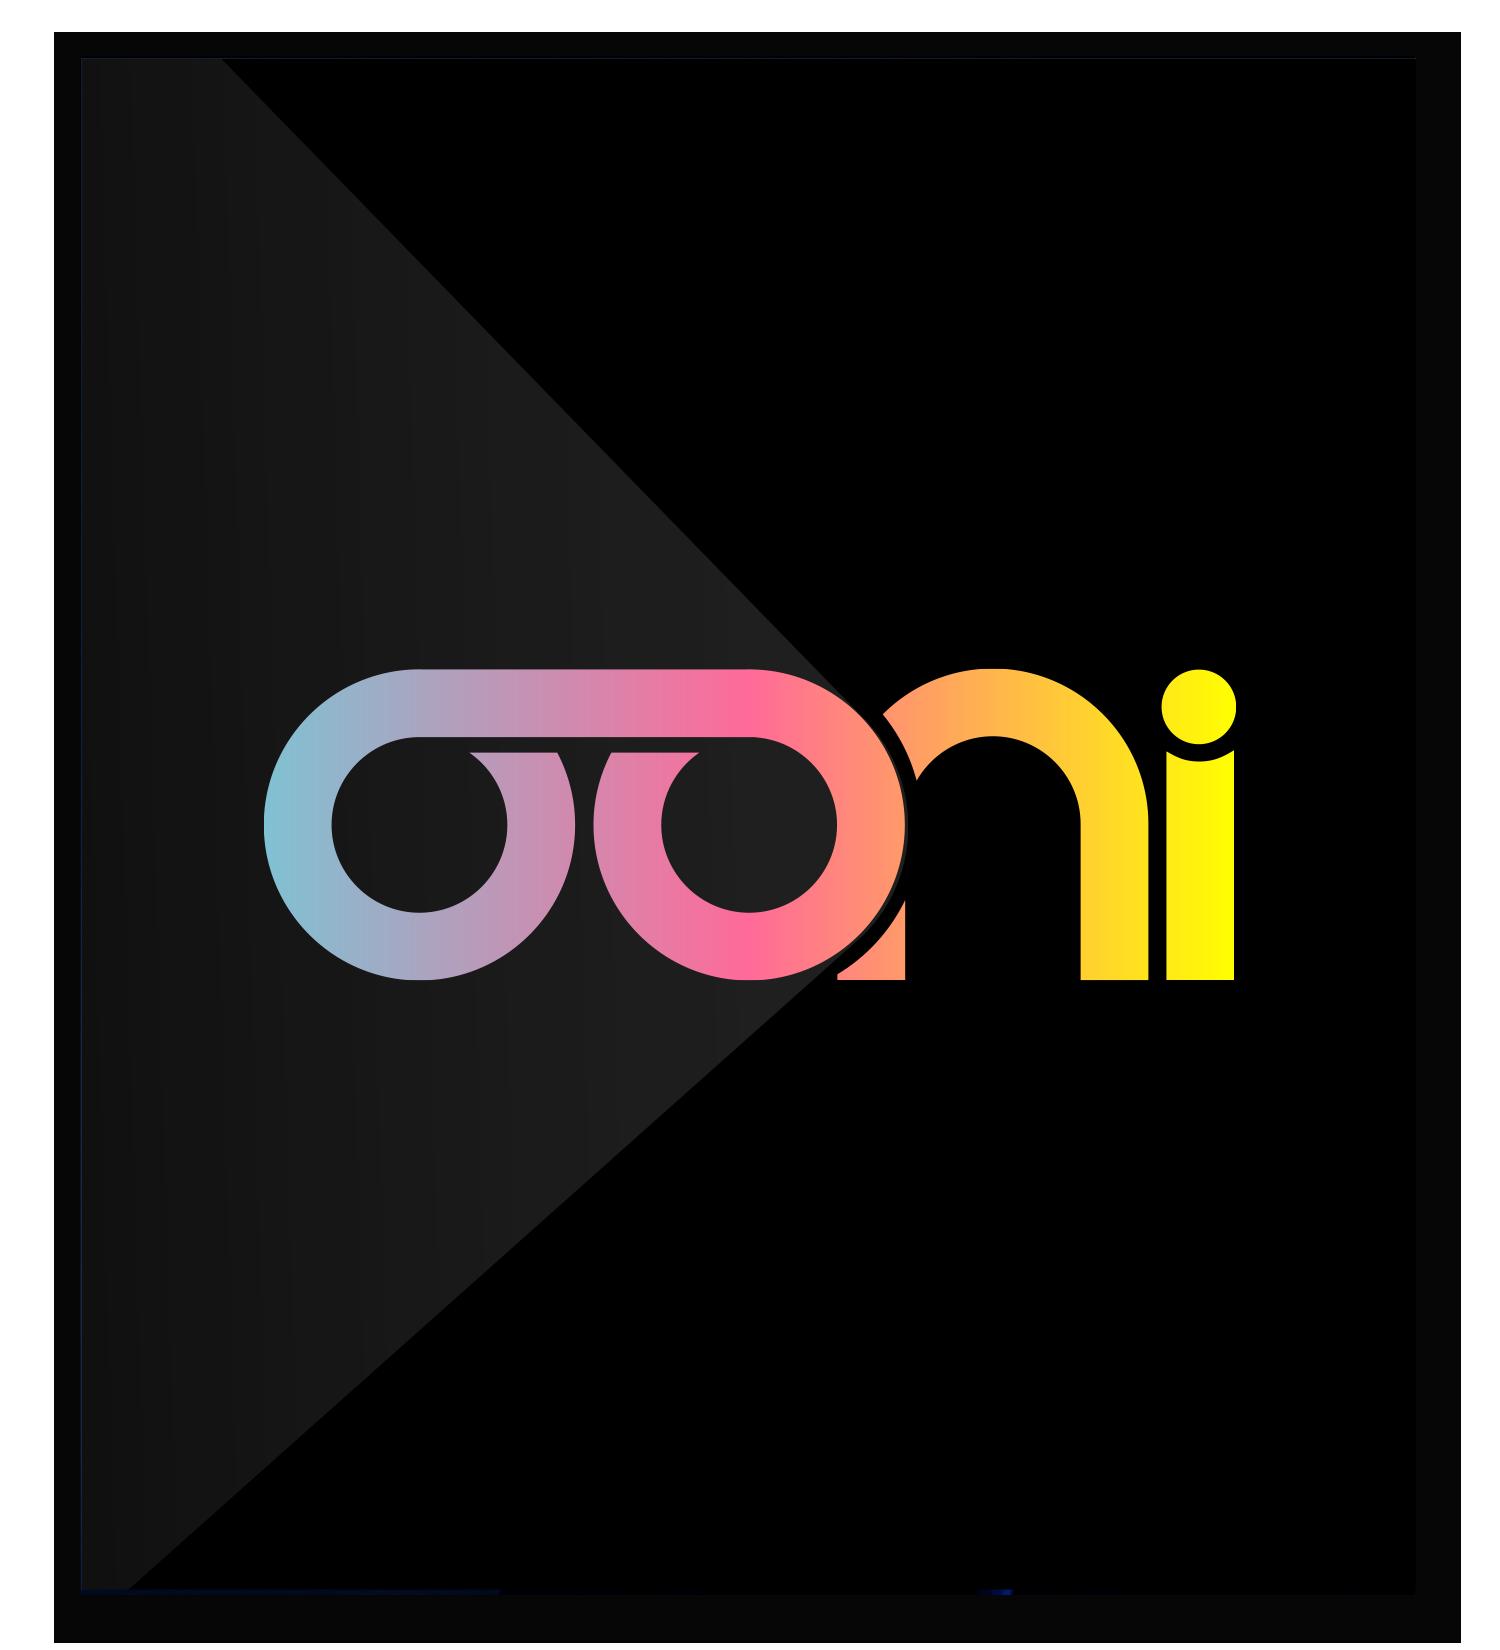 Ooni-portfolio-img